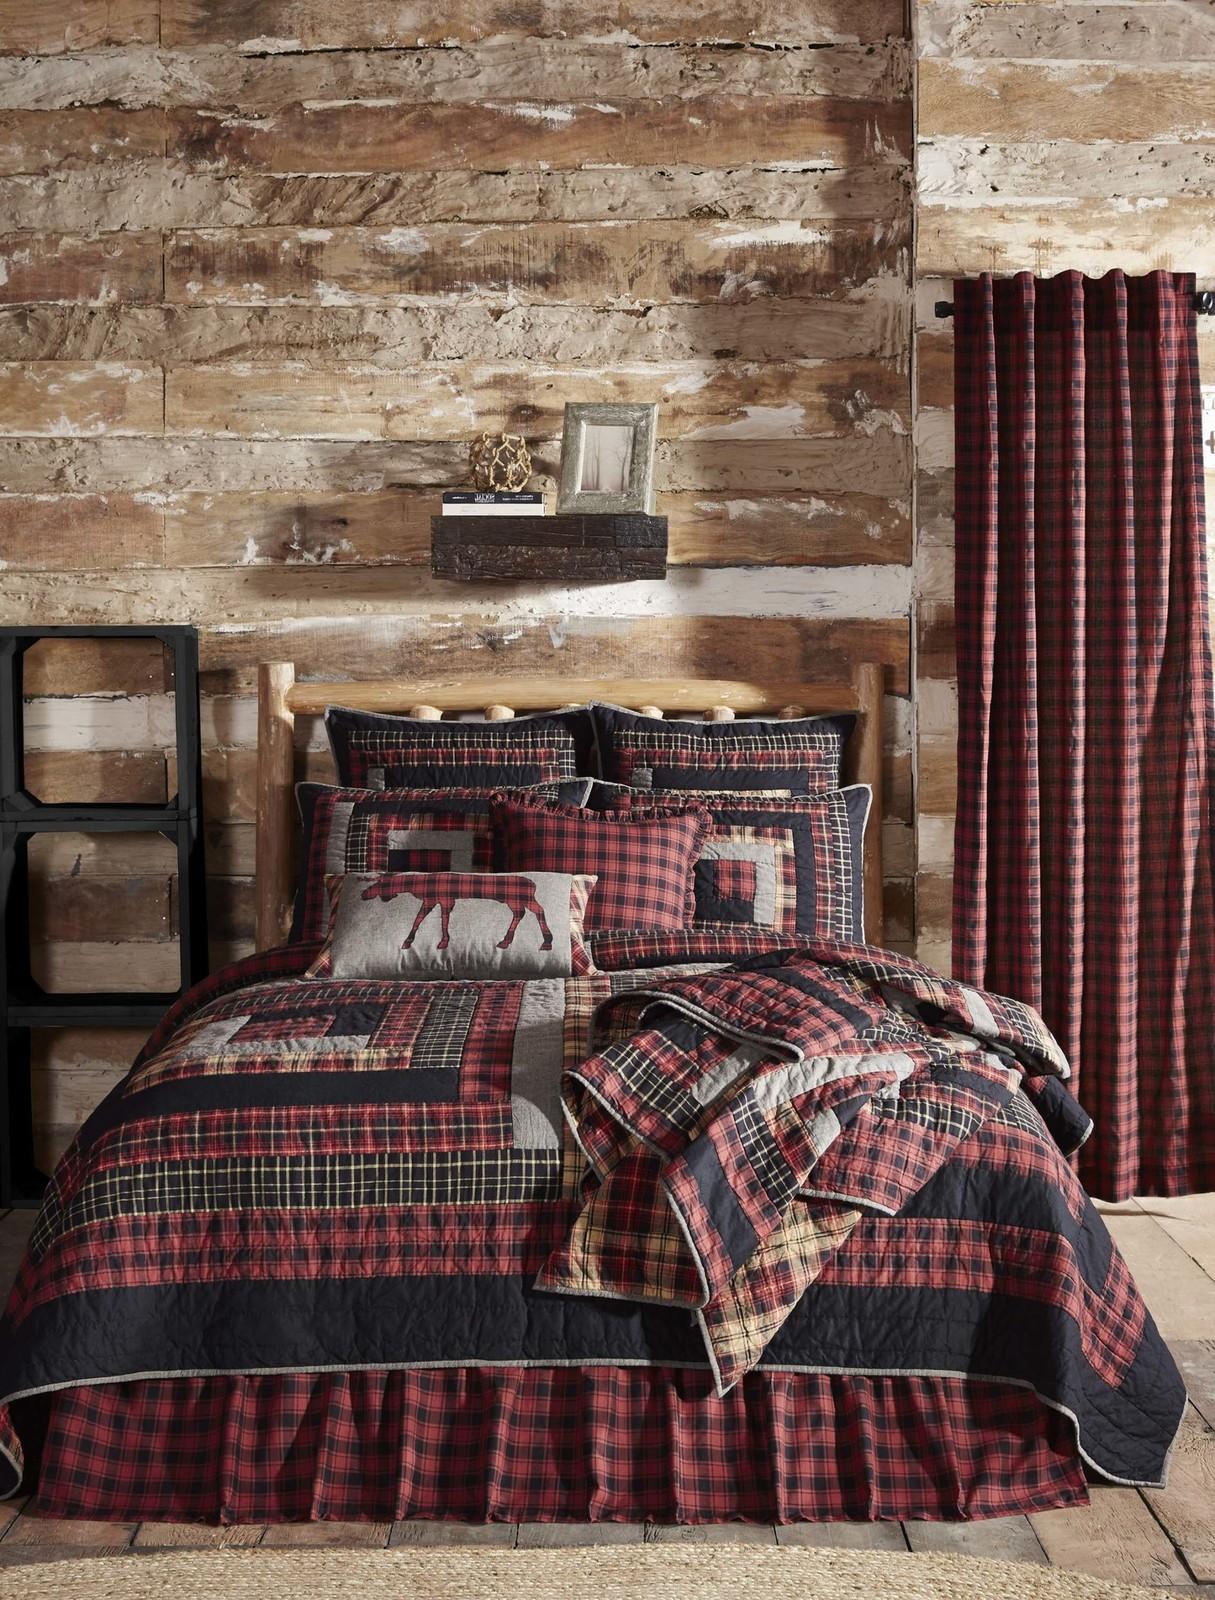 6-pc Cumberland Luxury California King Quilt Bundle - Vhc Brands - Heirloom